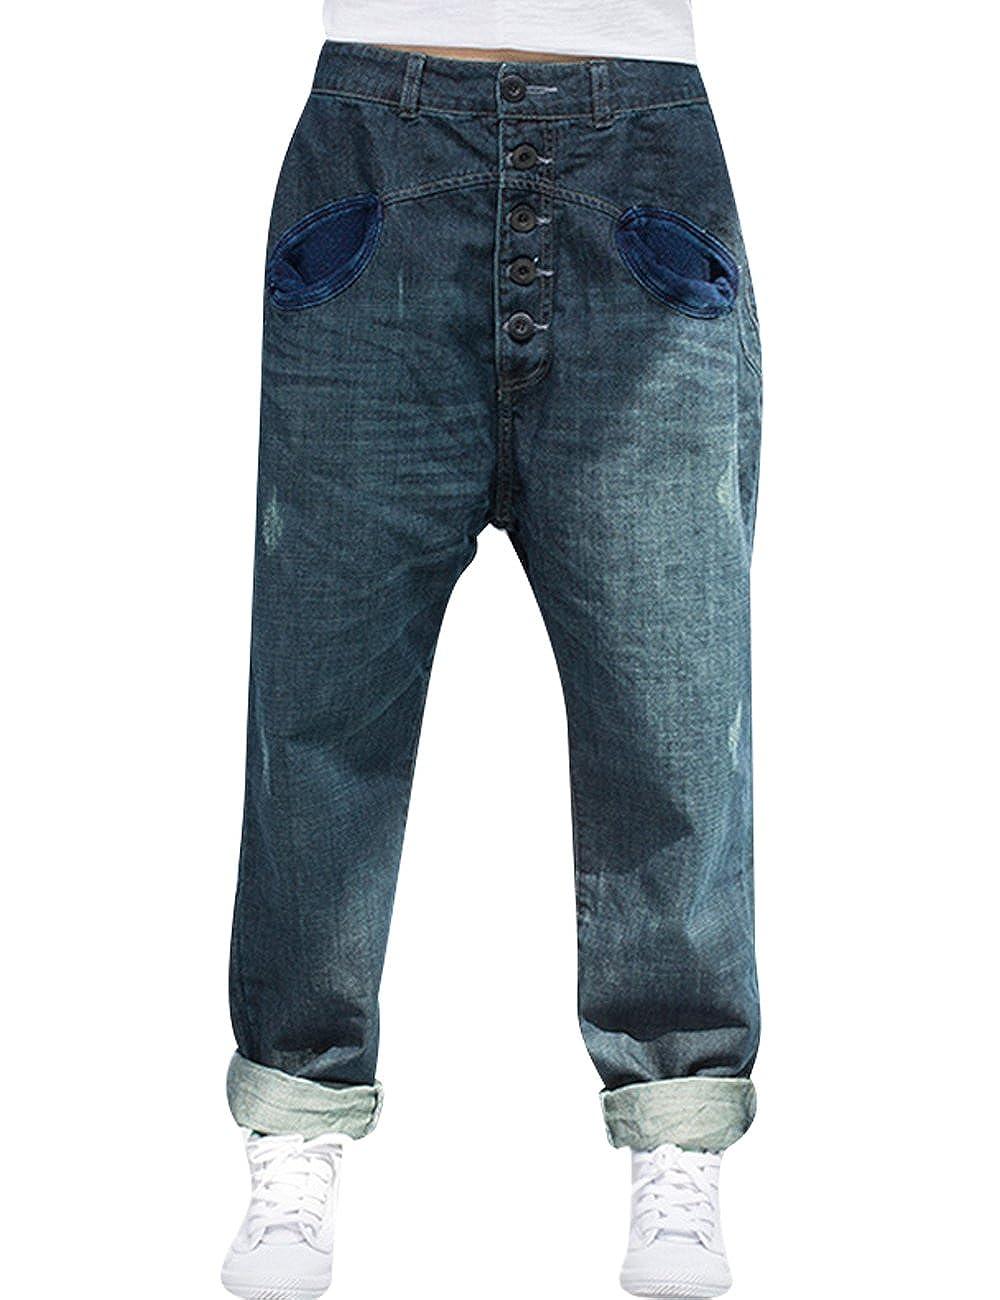 Youlee Donna Elastico in Vita Harem Pantaloni Cotone Jeans